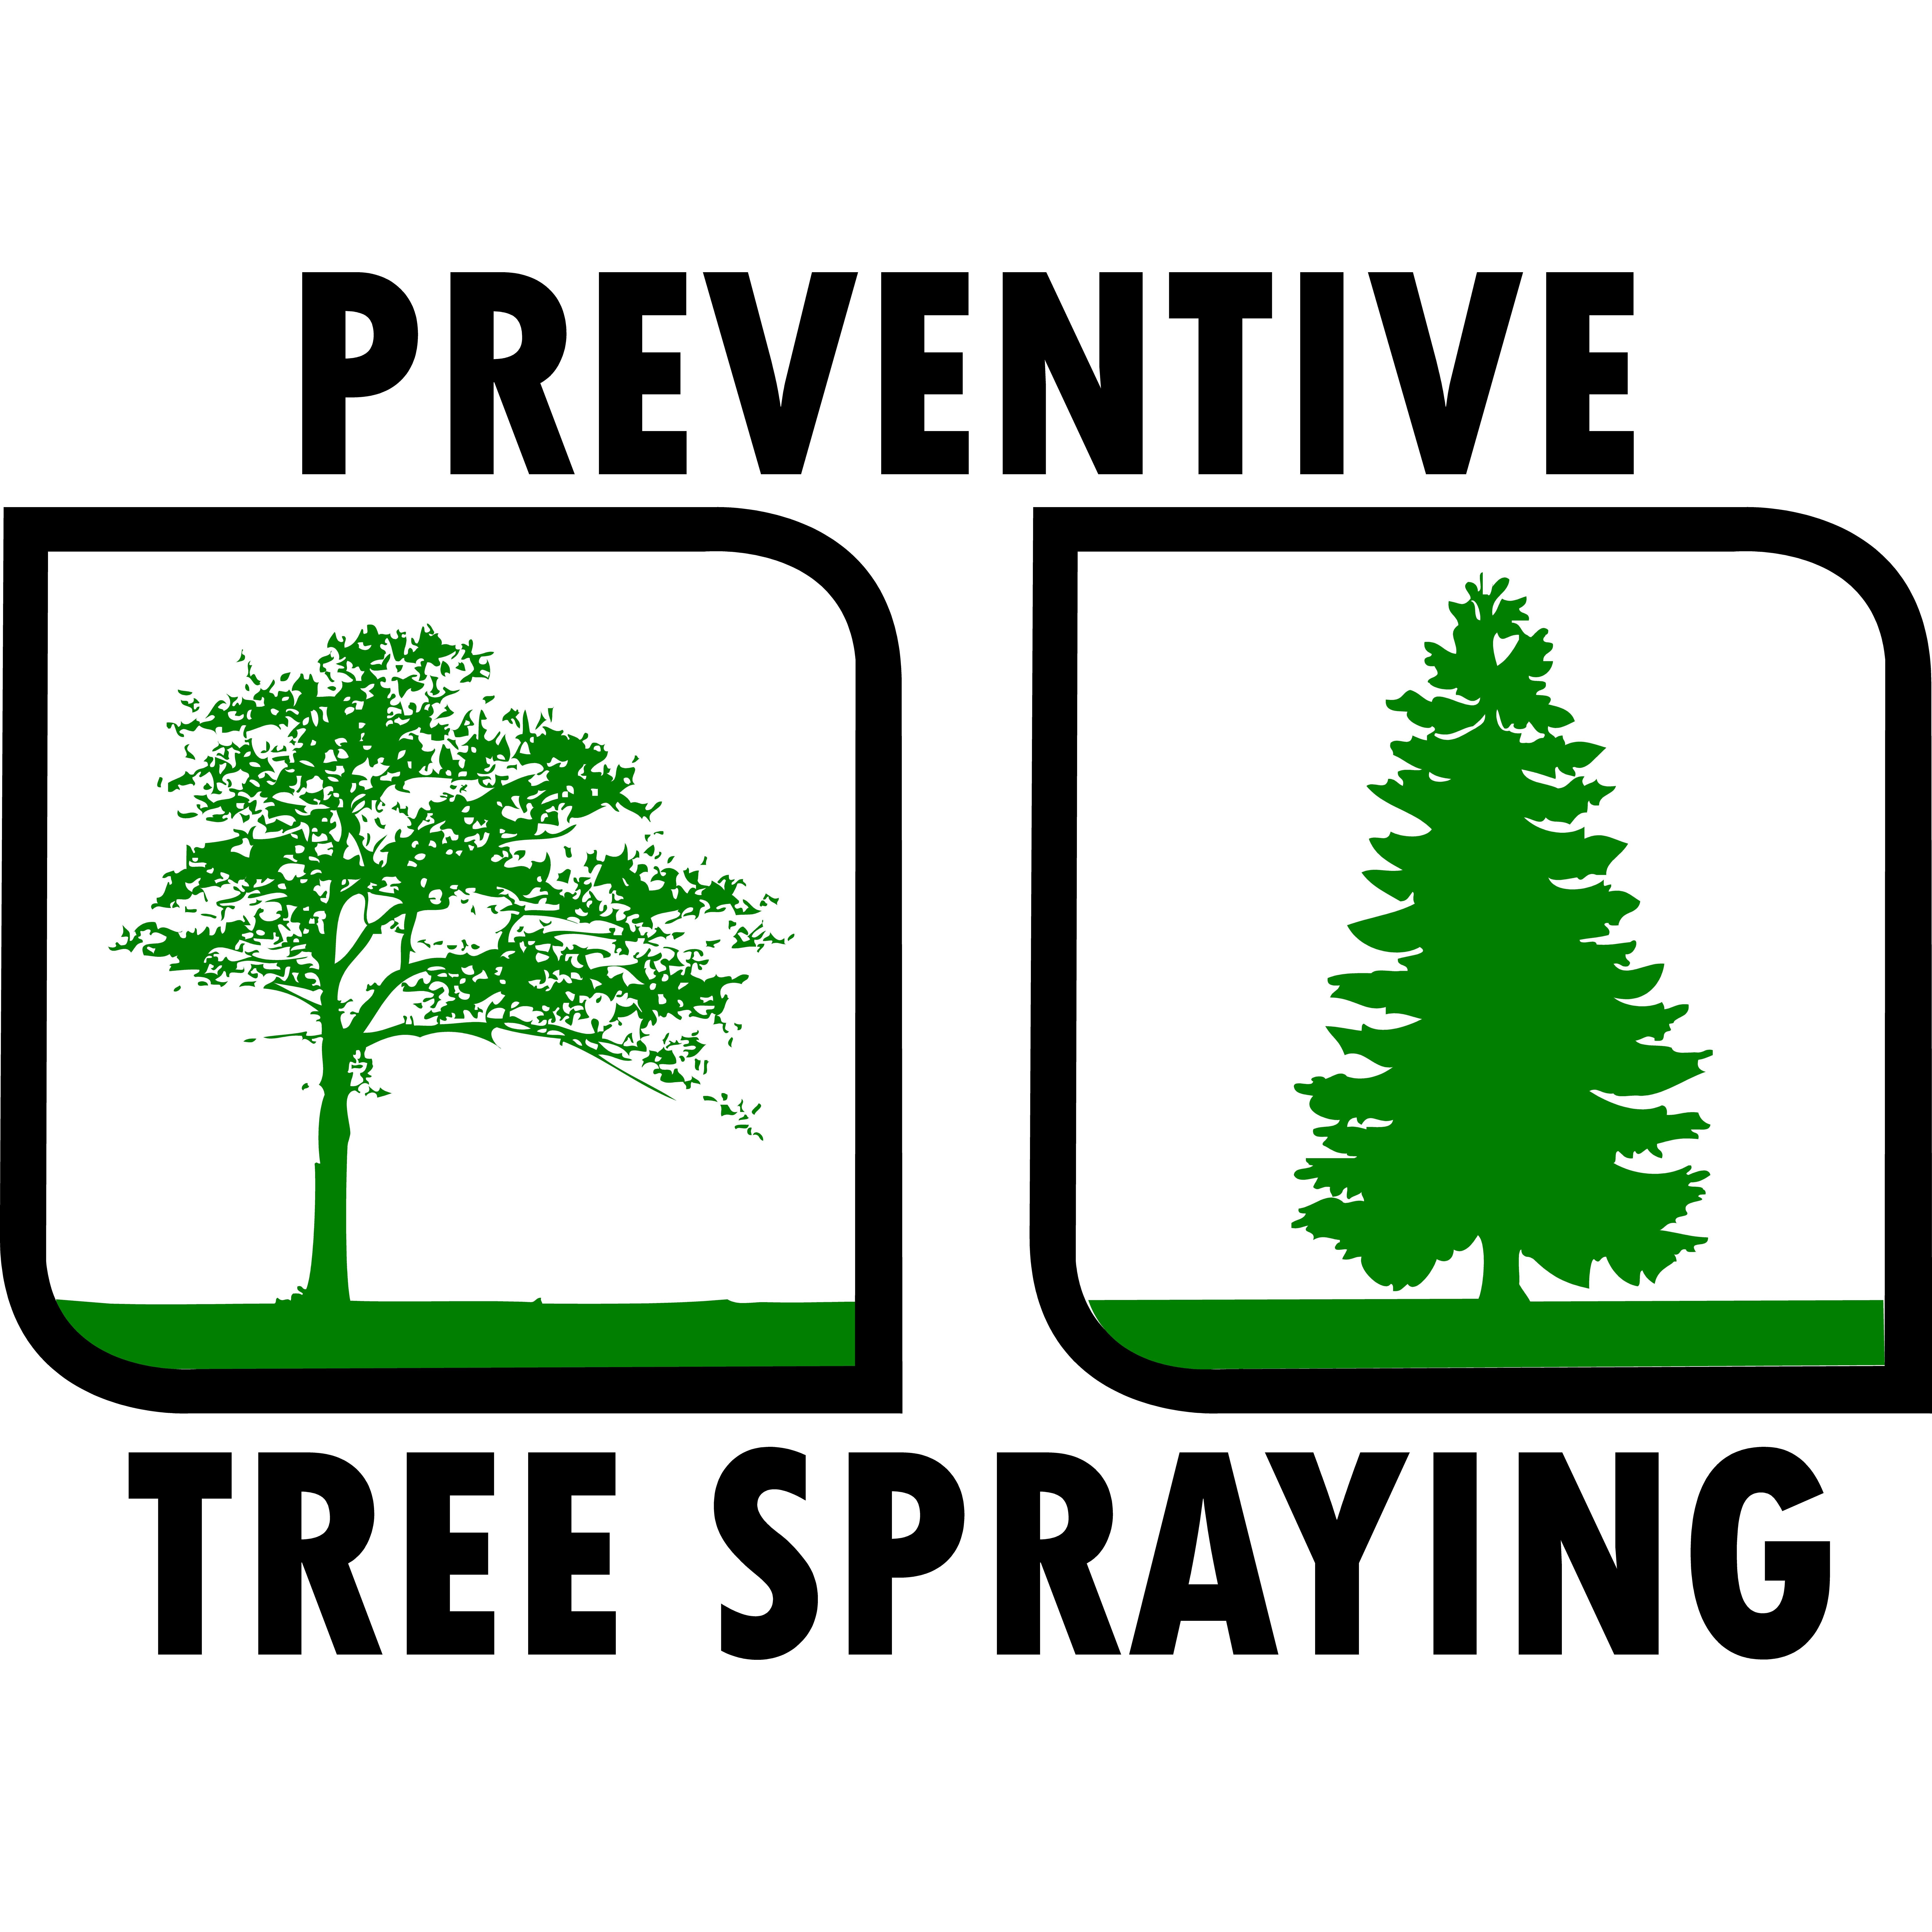 Preventive Tree Spraying